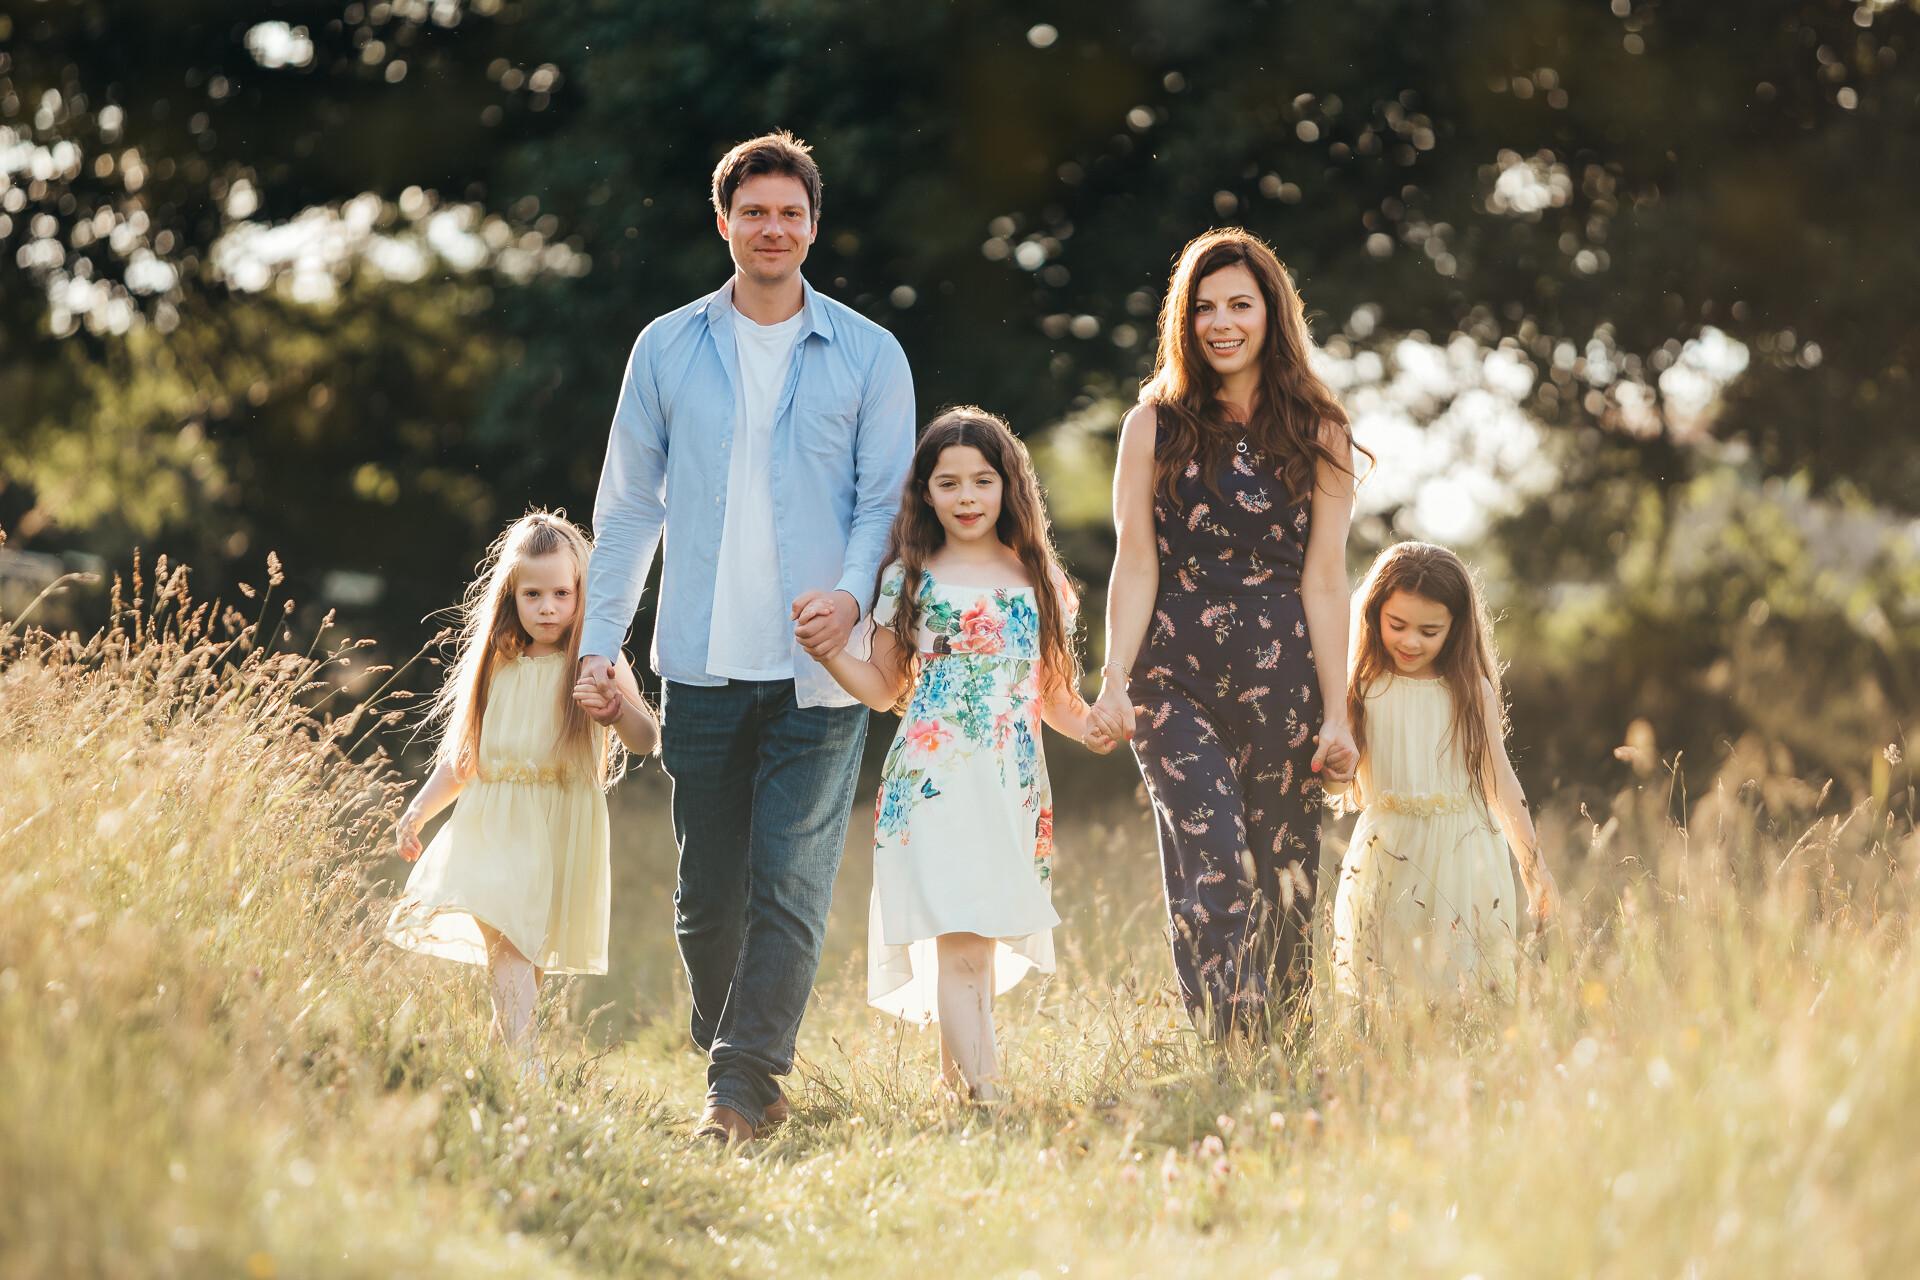 Family portrait photography - outdoor location portrait